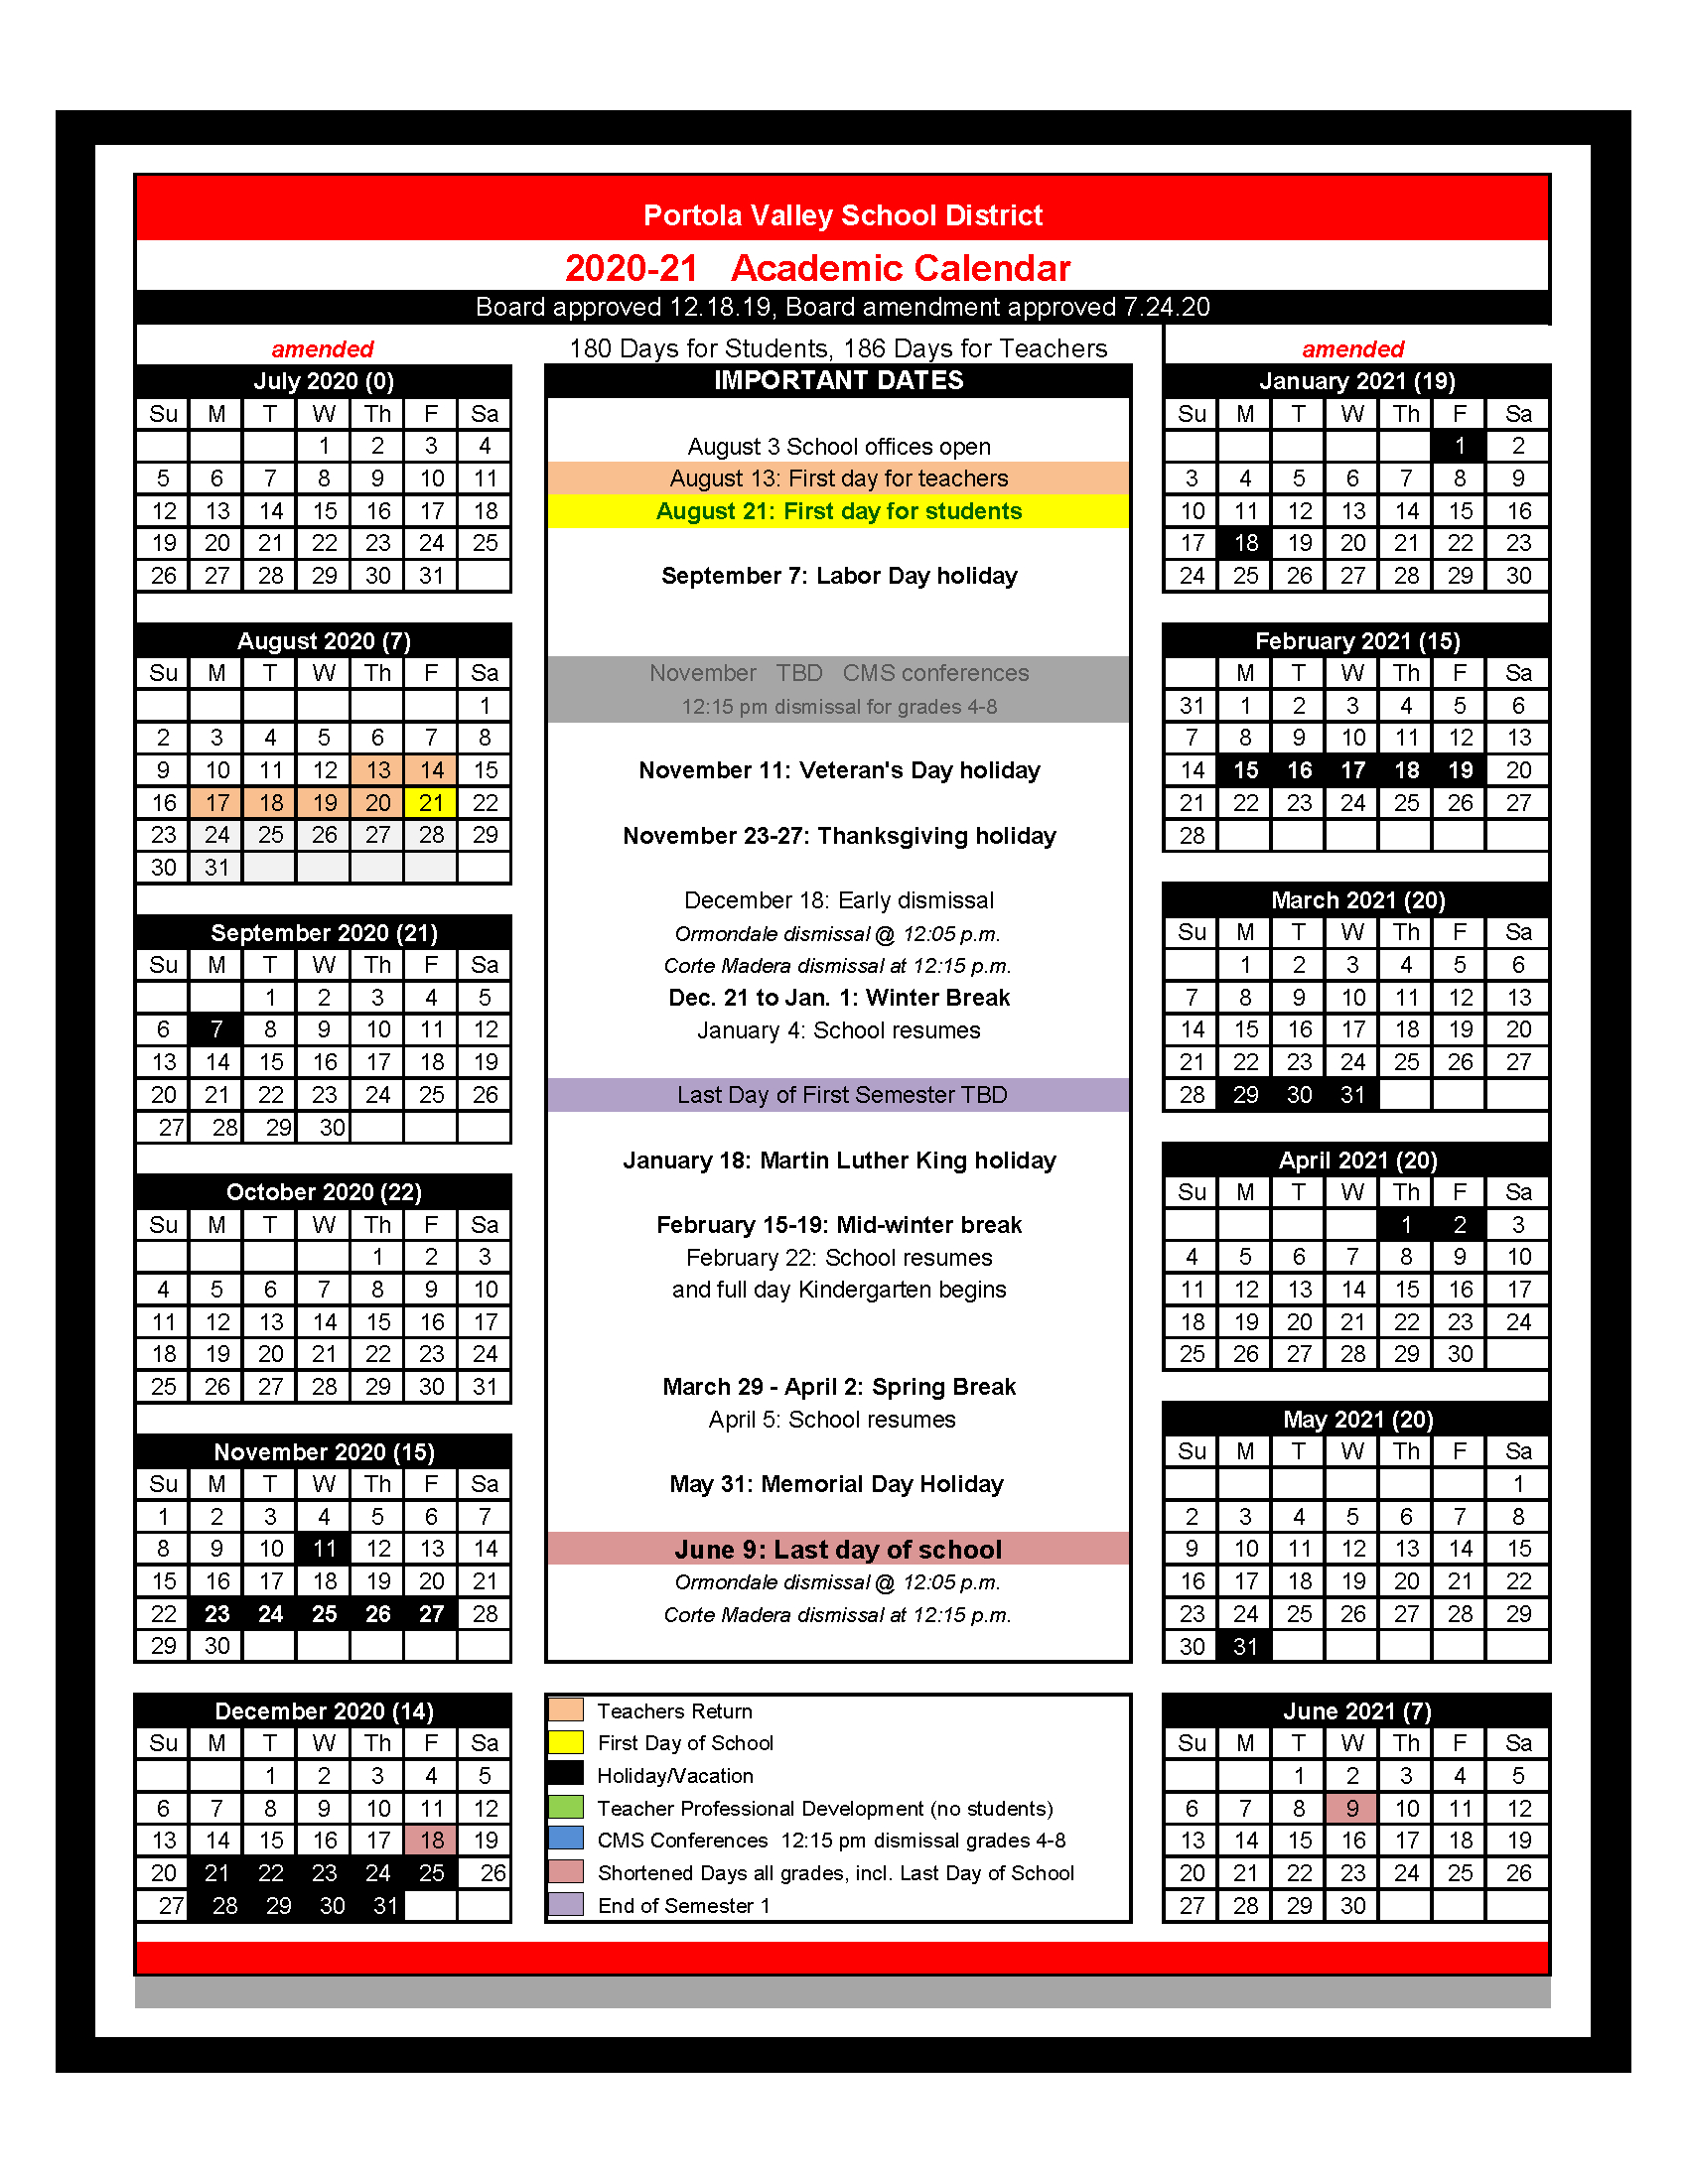 2020-2021 School Year Calendar - Ormondale School